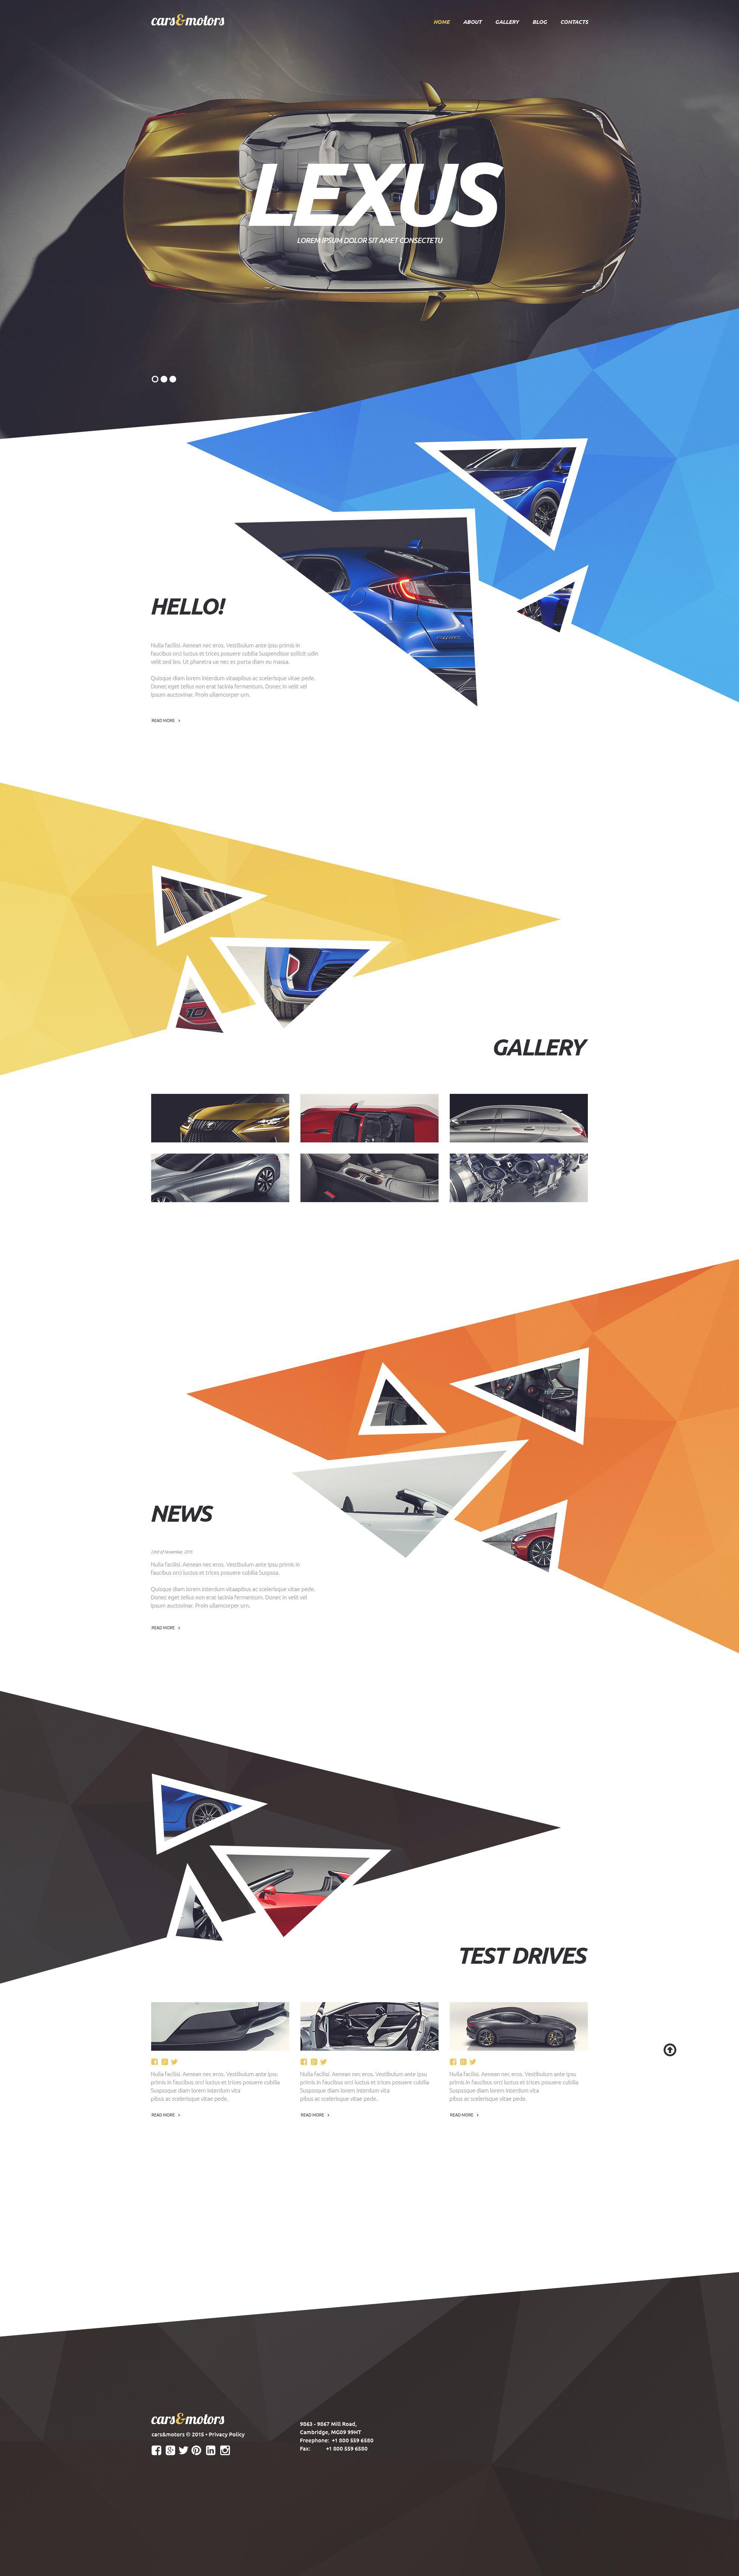 Creative Geometric Design WordPress Theme